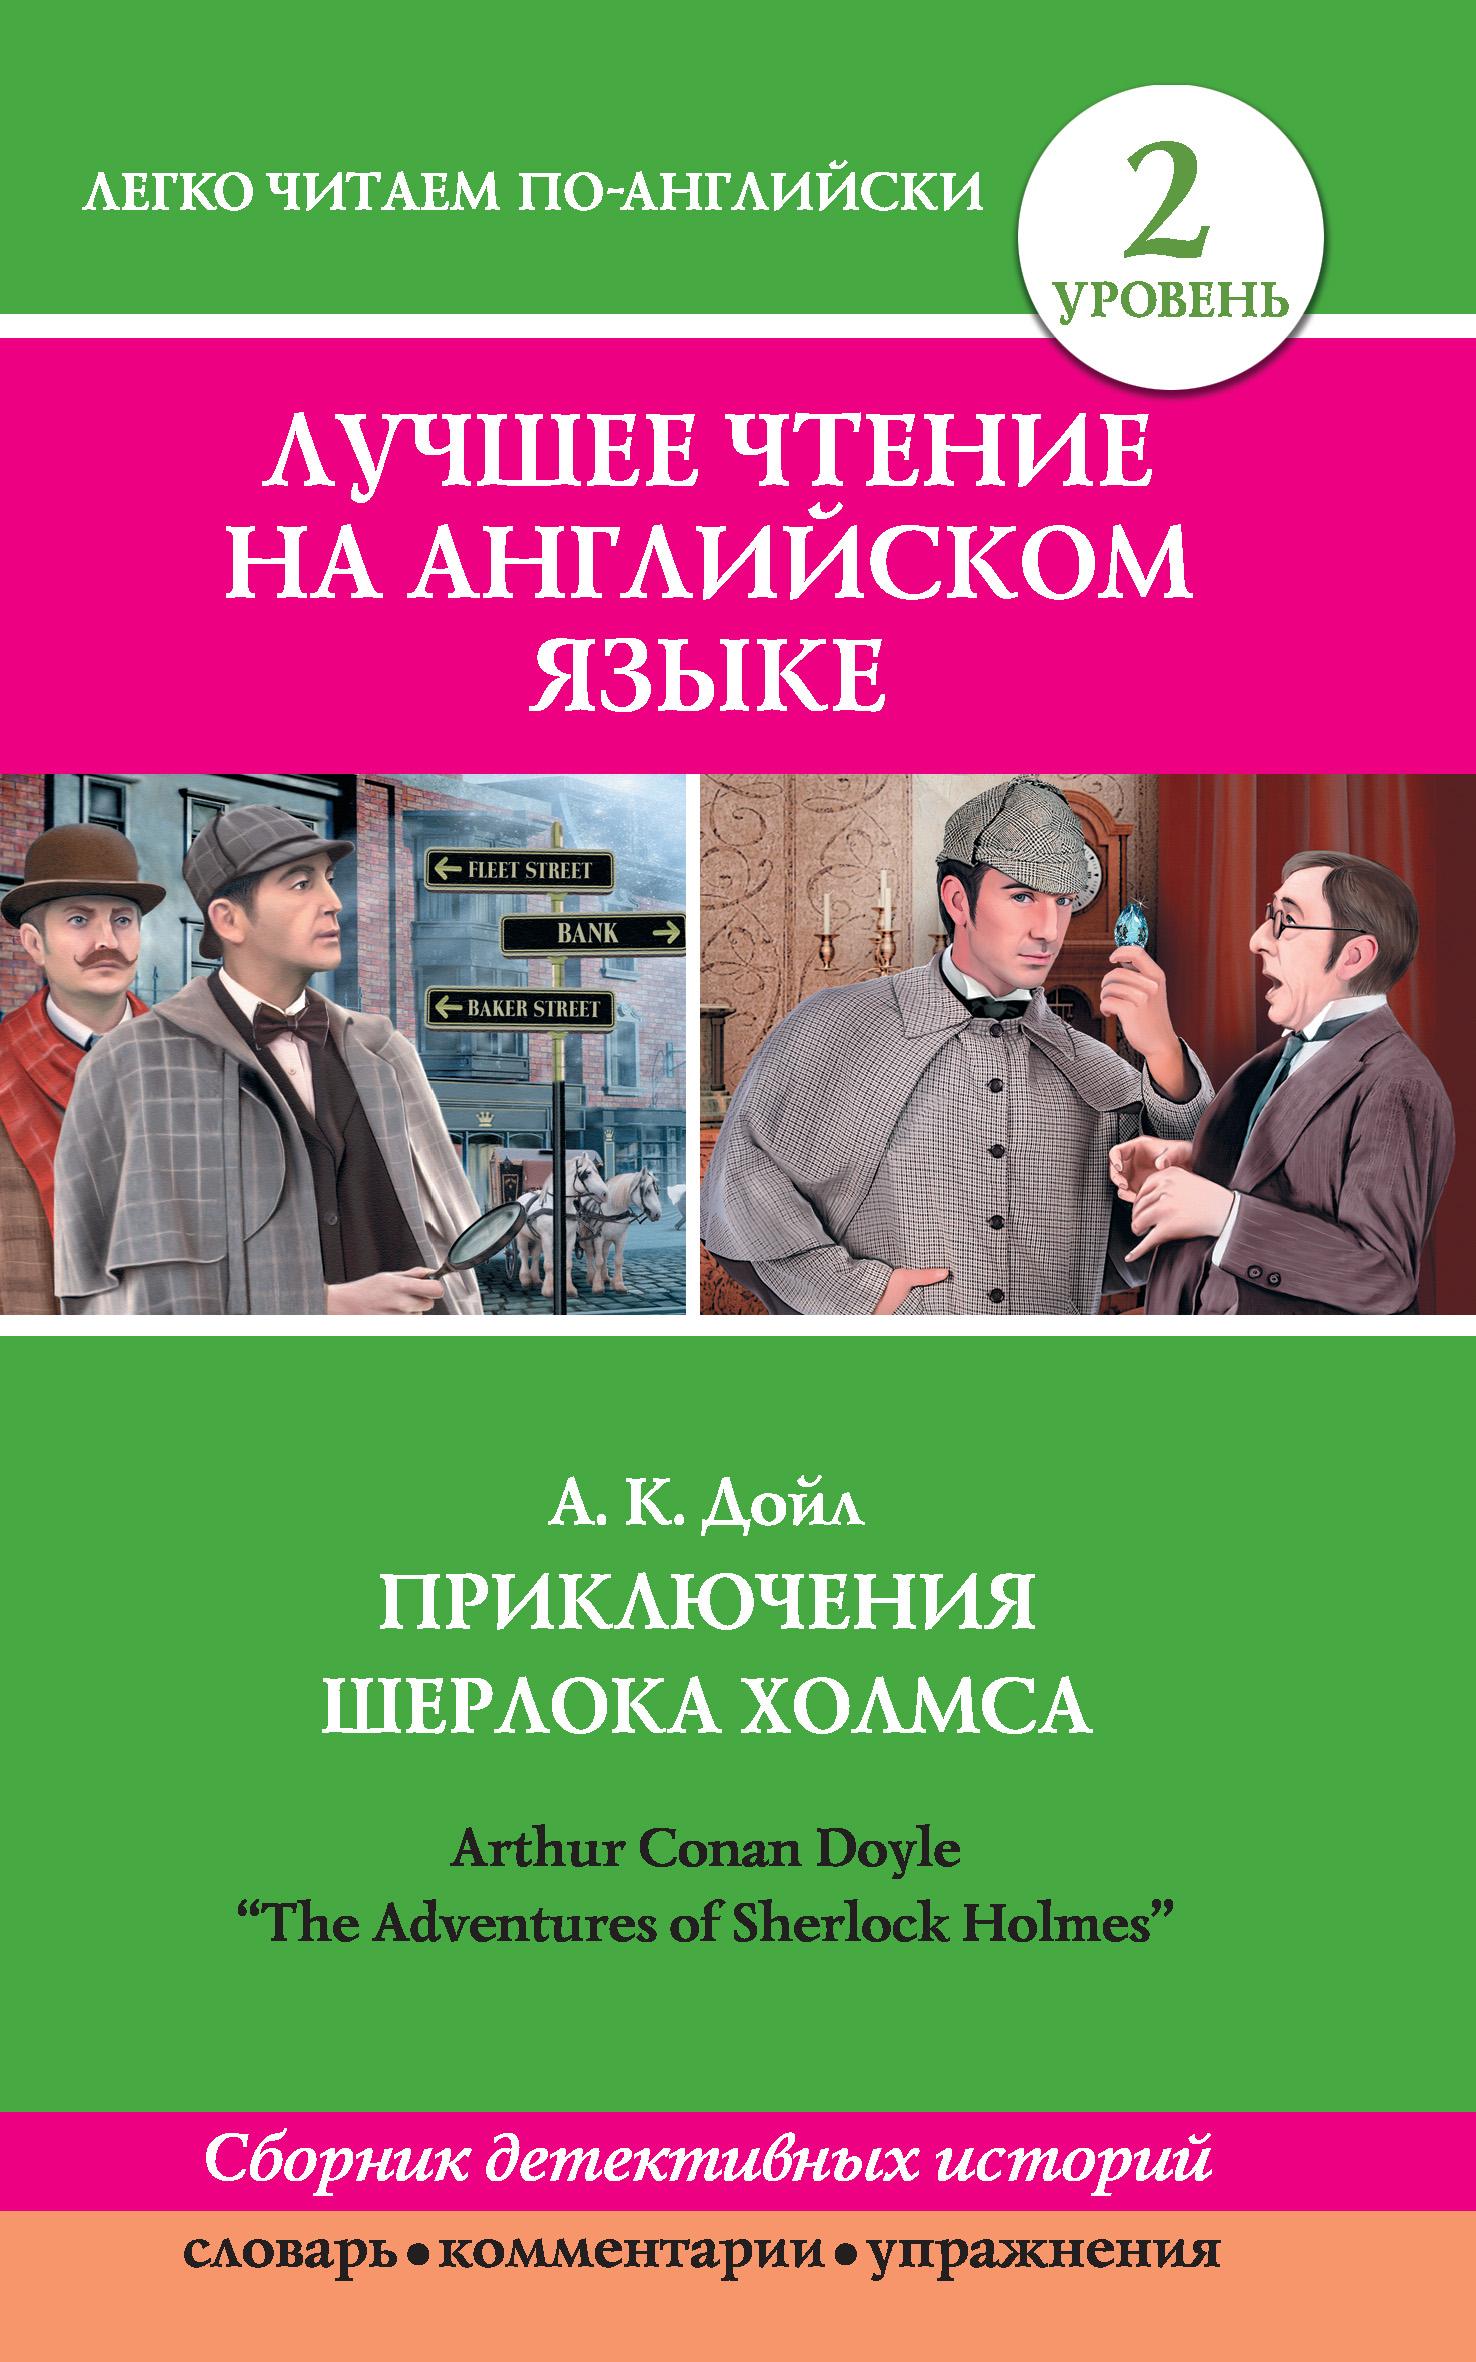 Артур Конан Дойл Приключения Шерлока Холмса / The Adventures of Sherlock Holmes (сборник) артур конан дойл приключения шерлока холмса the adventures of sherlock holmes сборник